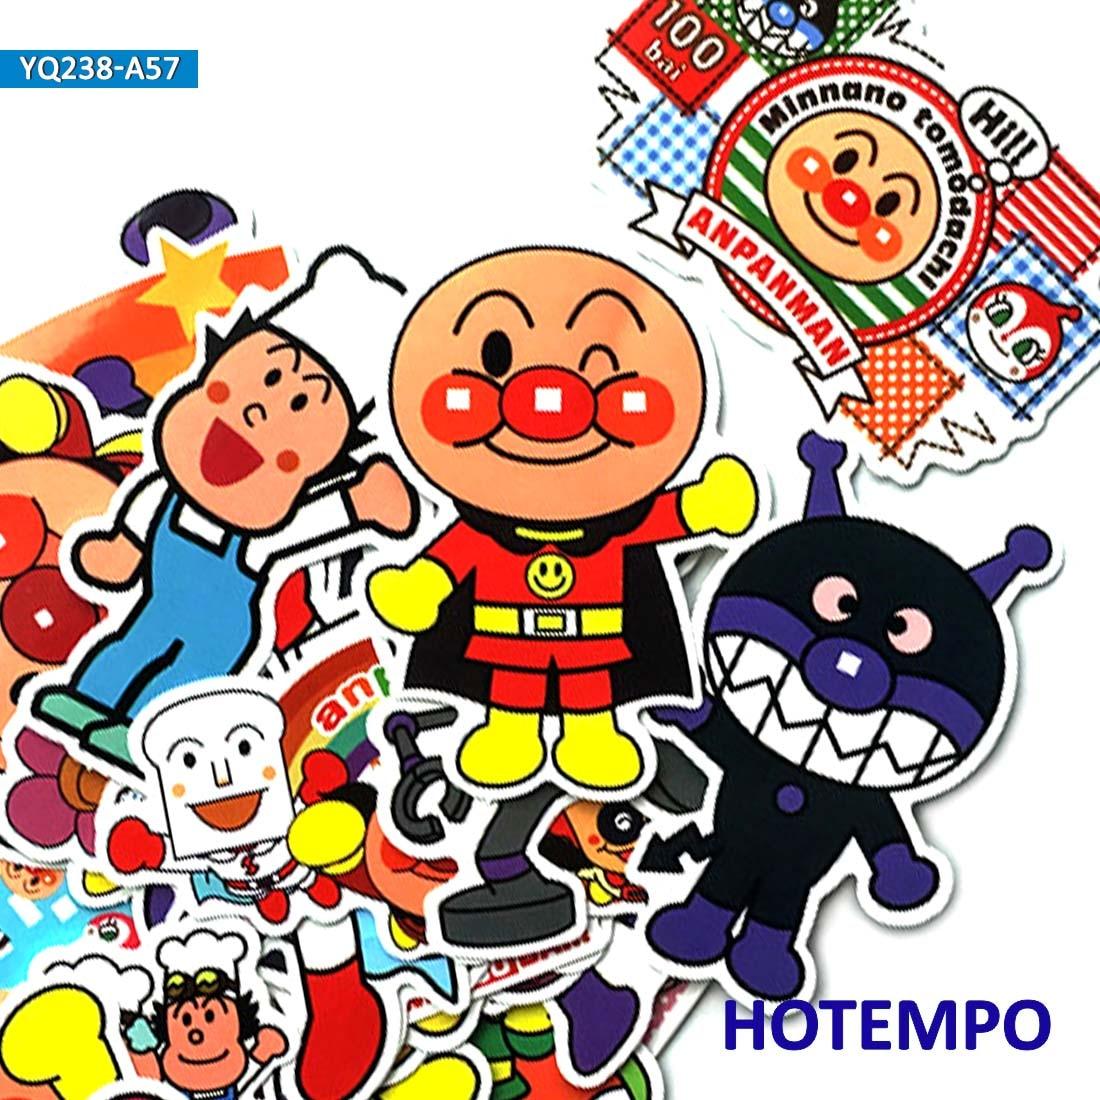 57pcs Kawaii Anime Anpanman Dokin-chan Baikinman Stickers For DIY Mobile Phone Laptop Luggage Suitcase Skateboard Decal Stickers